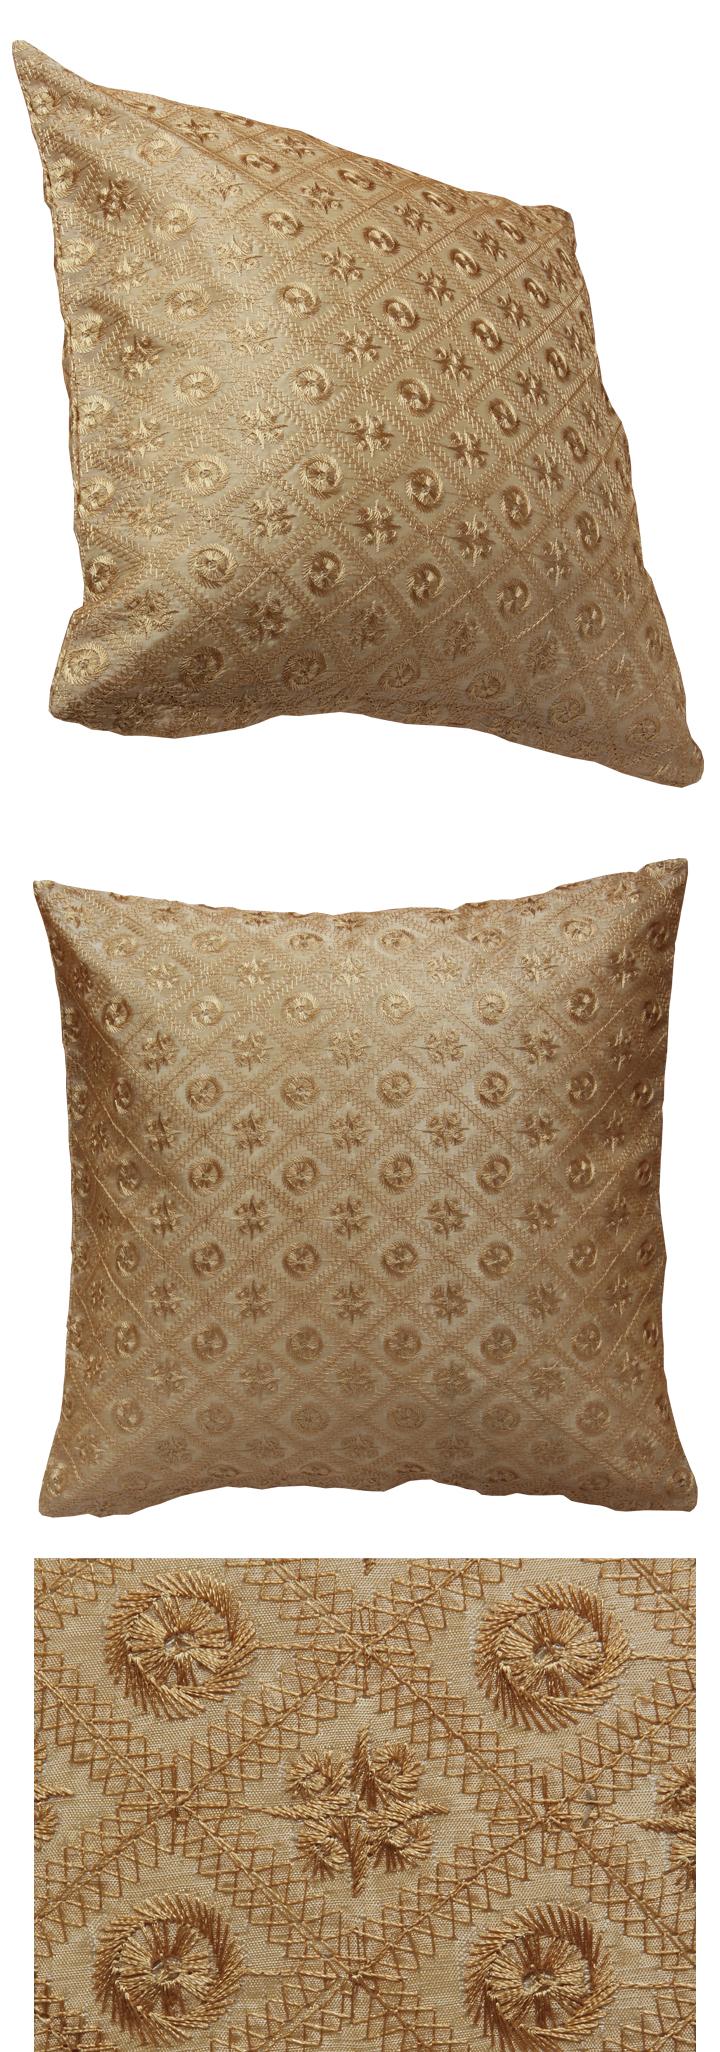 kissenh lle 40x40 cm beige braun satin optik kissenbezug. Black Bedroom Furniture Sets. Home Design Ideas